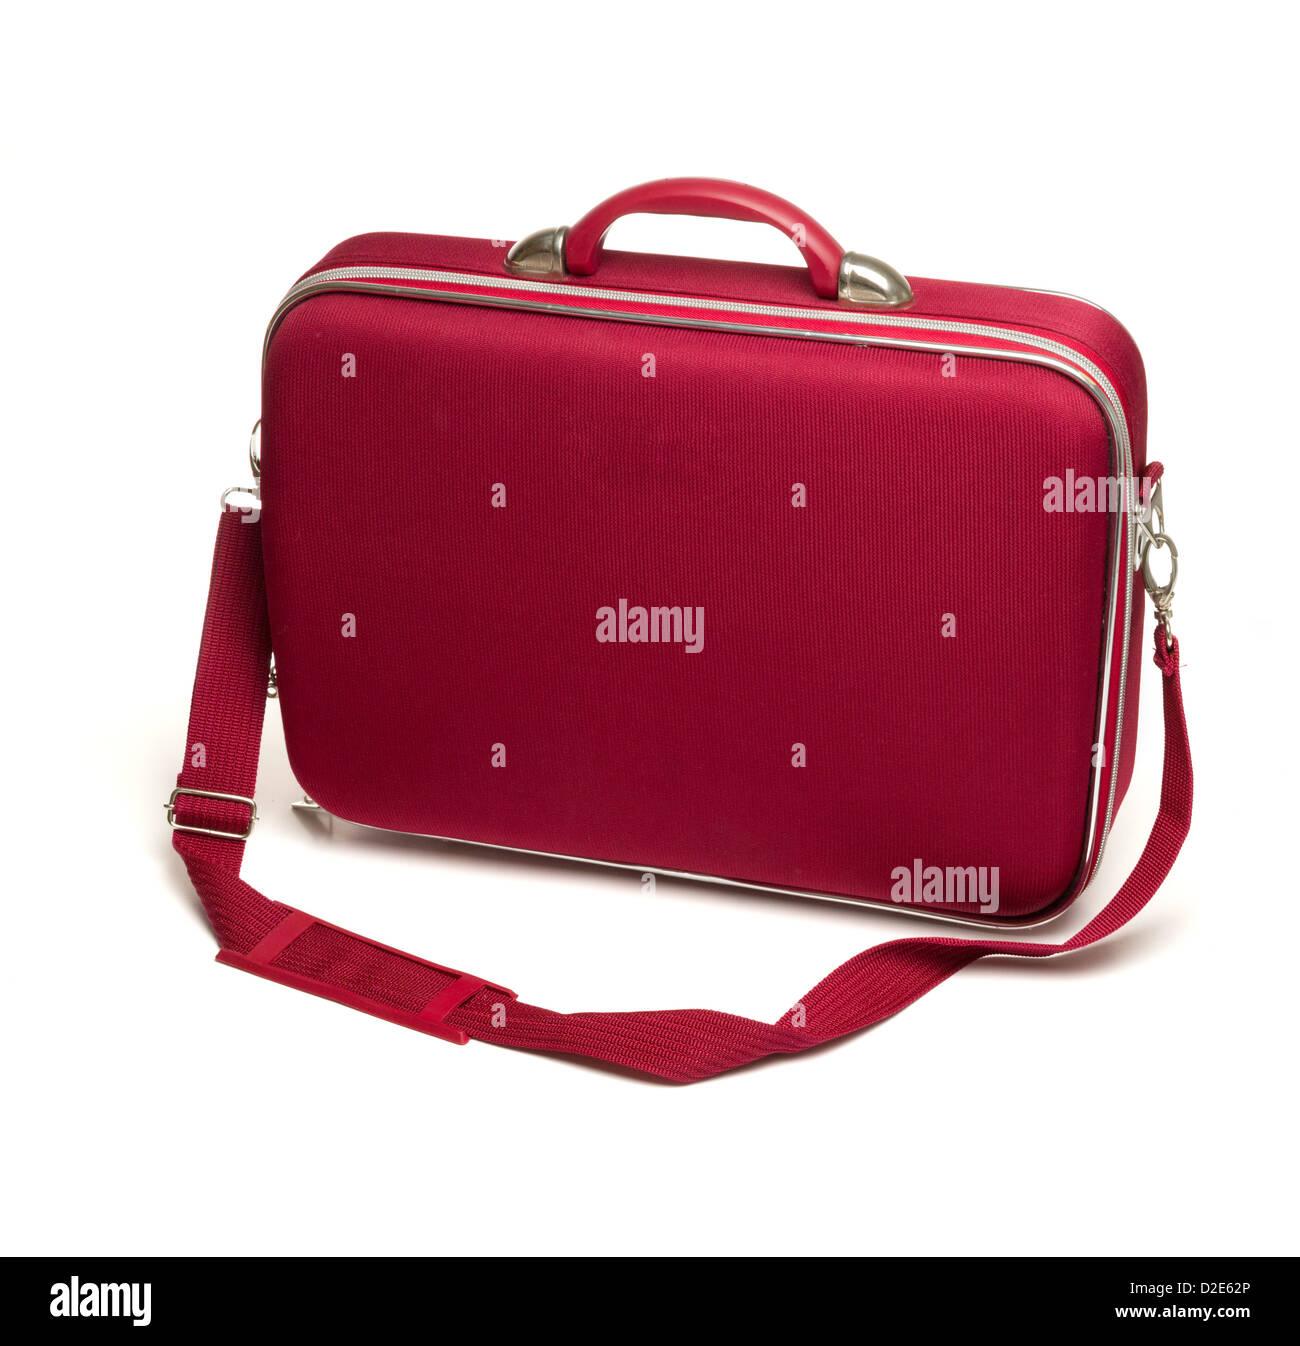 Red suitcase isolated on white background - Stock Image